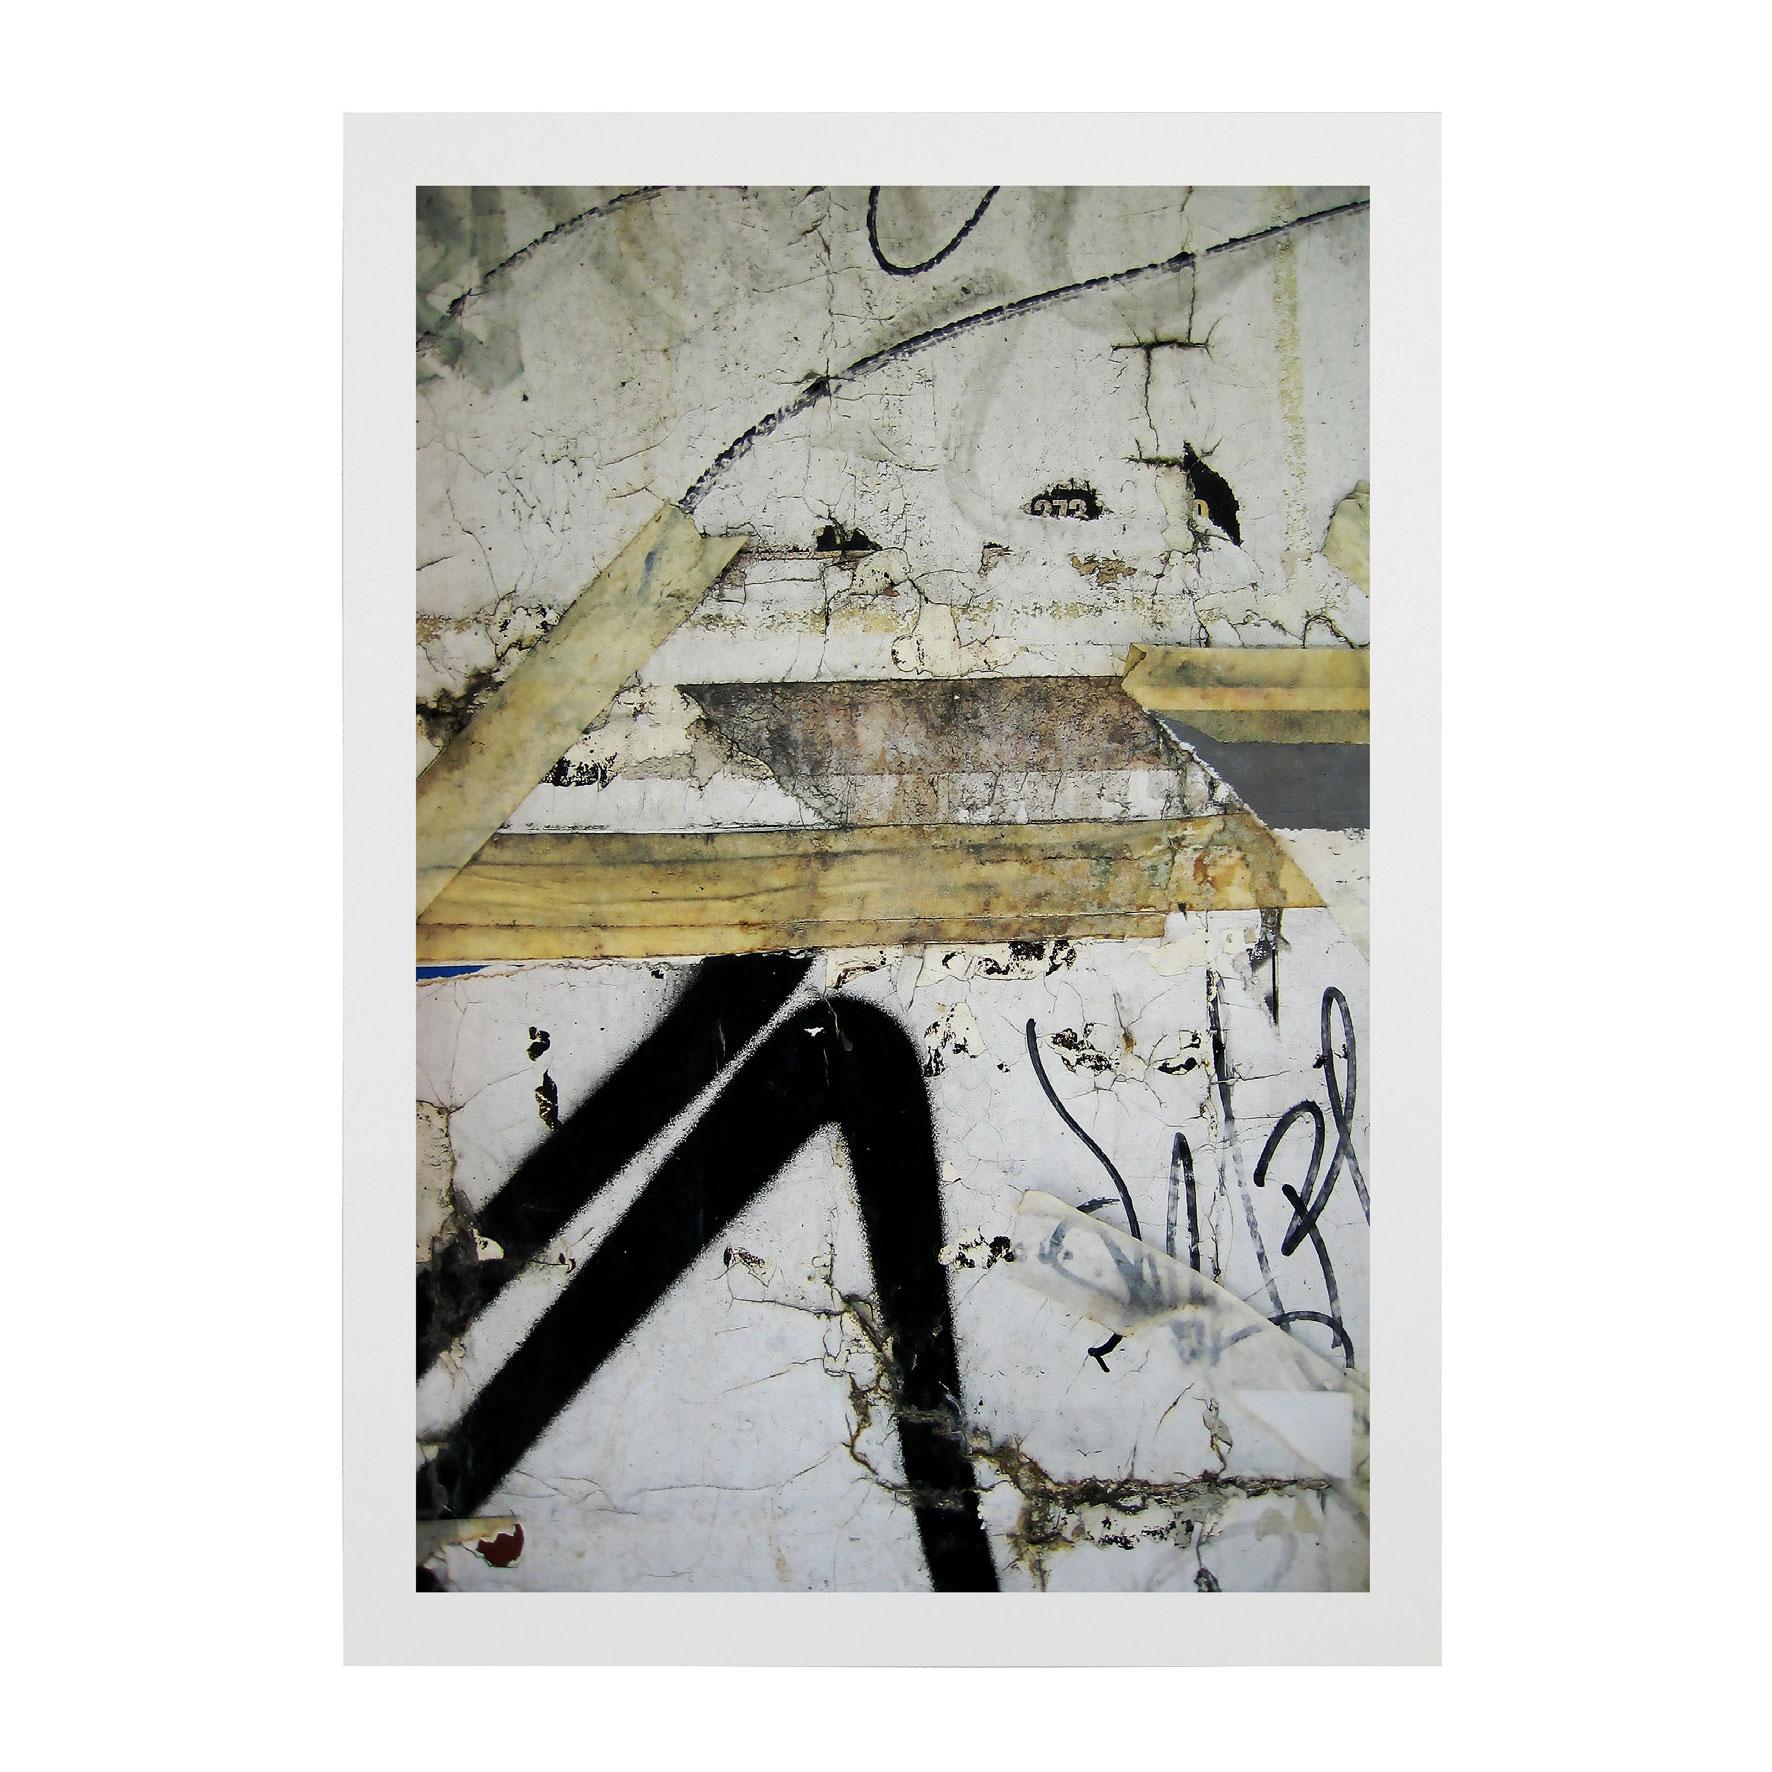 ARCHIVE-WEB-PICS-61